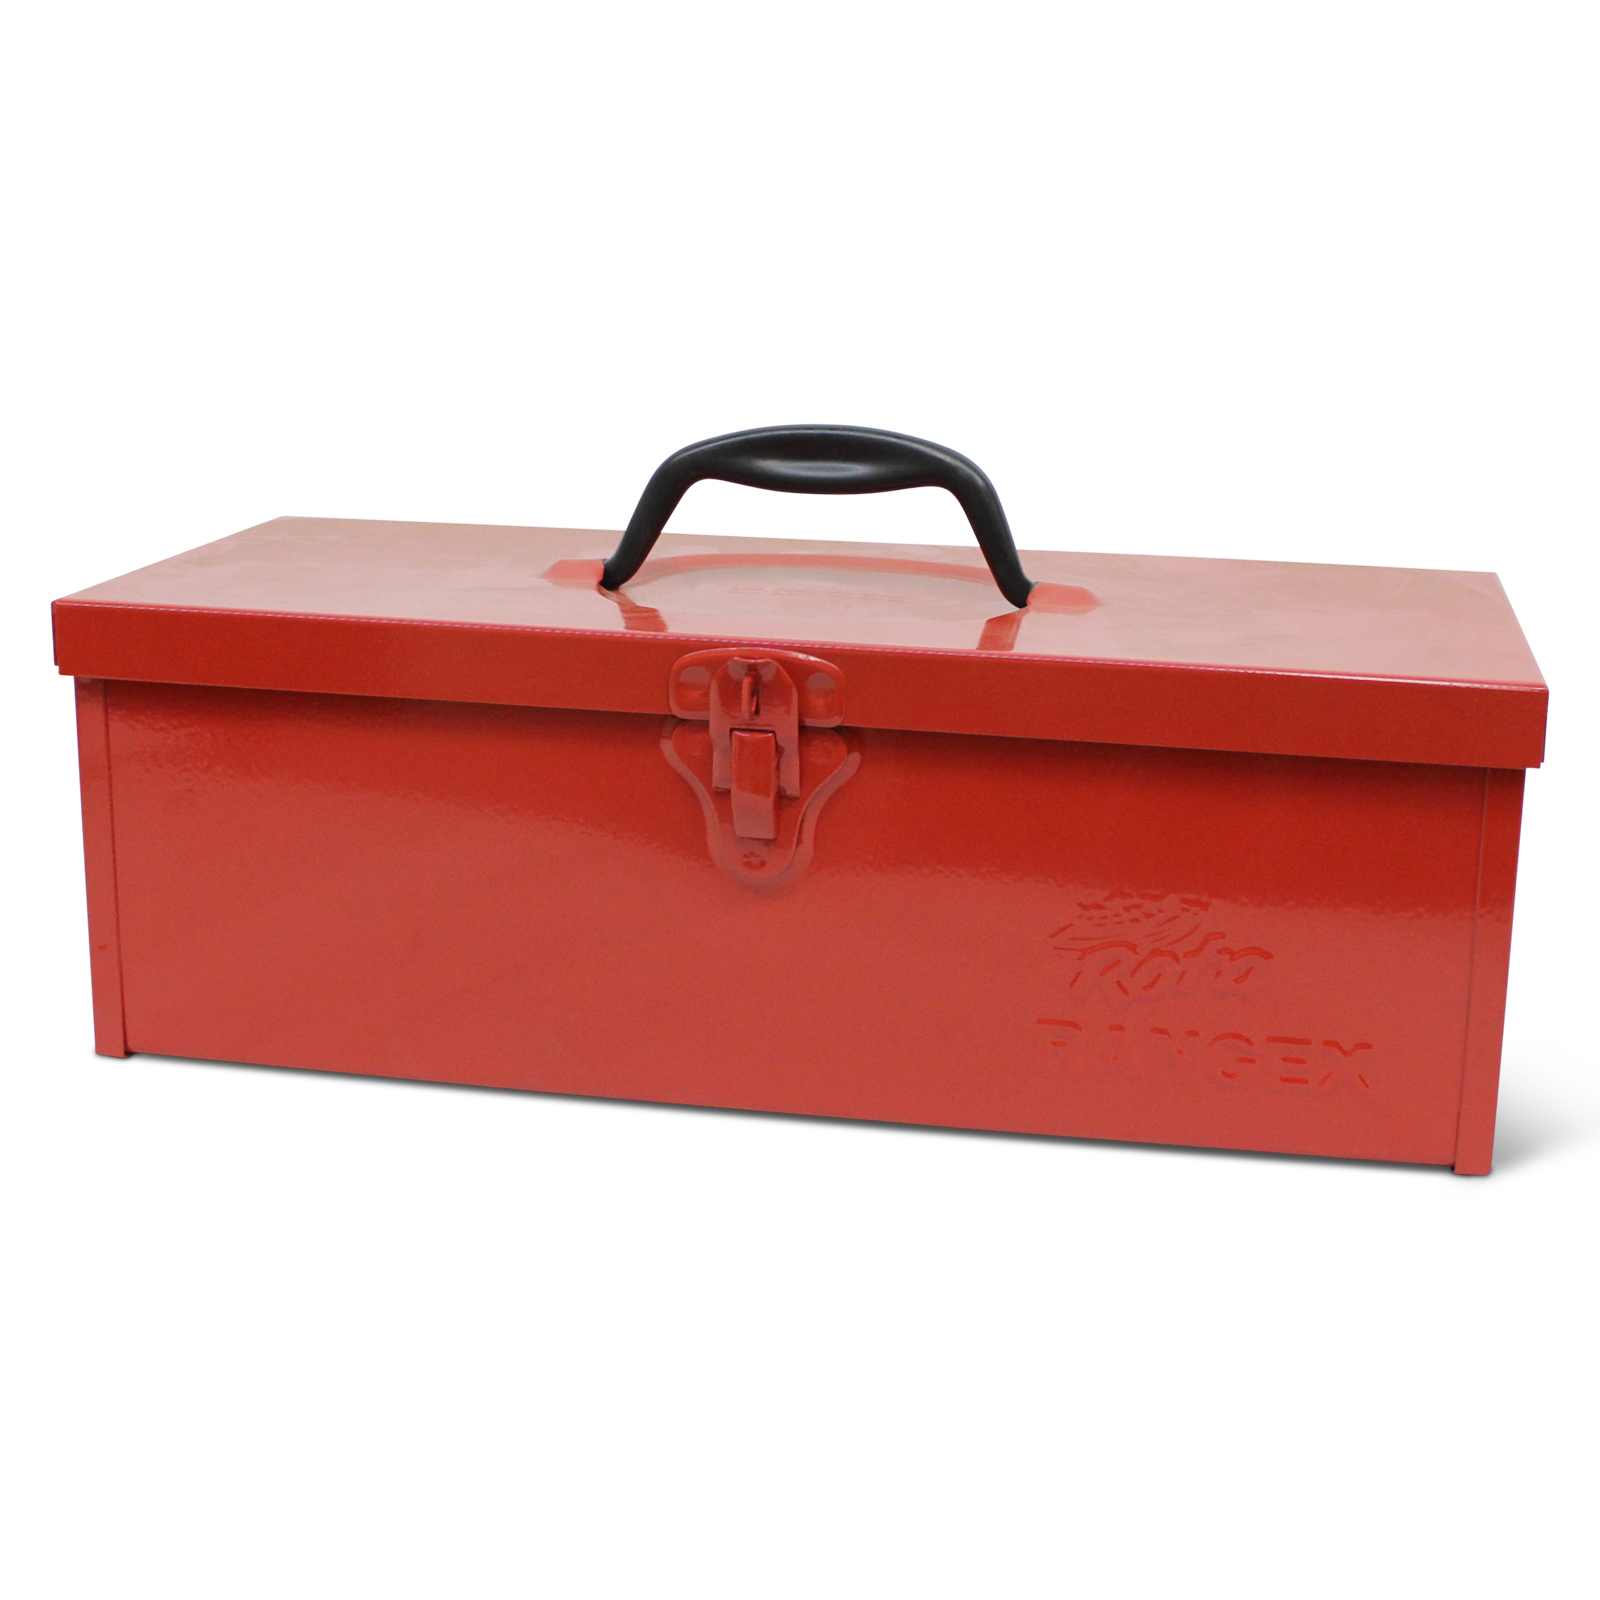 rangex tool box case scribing tool military boxes mitchells